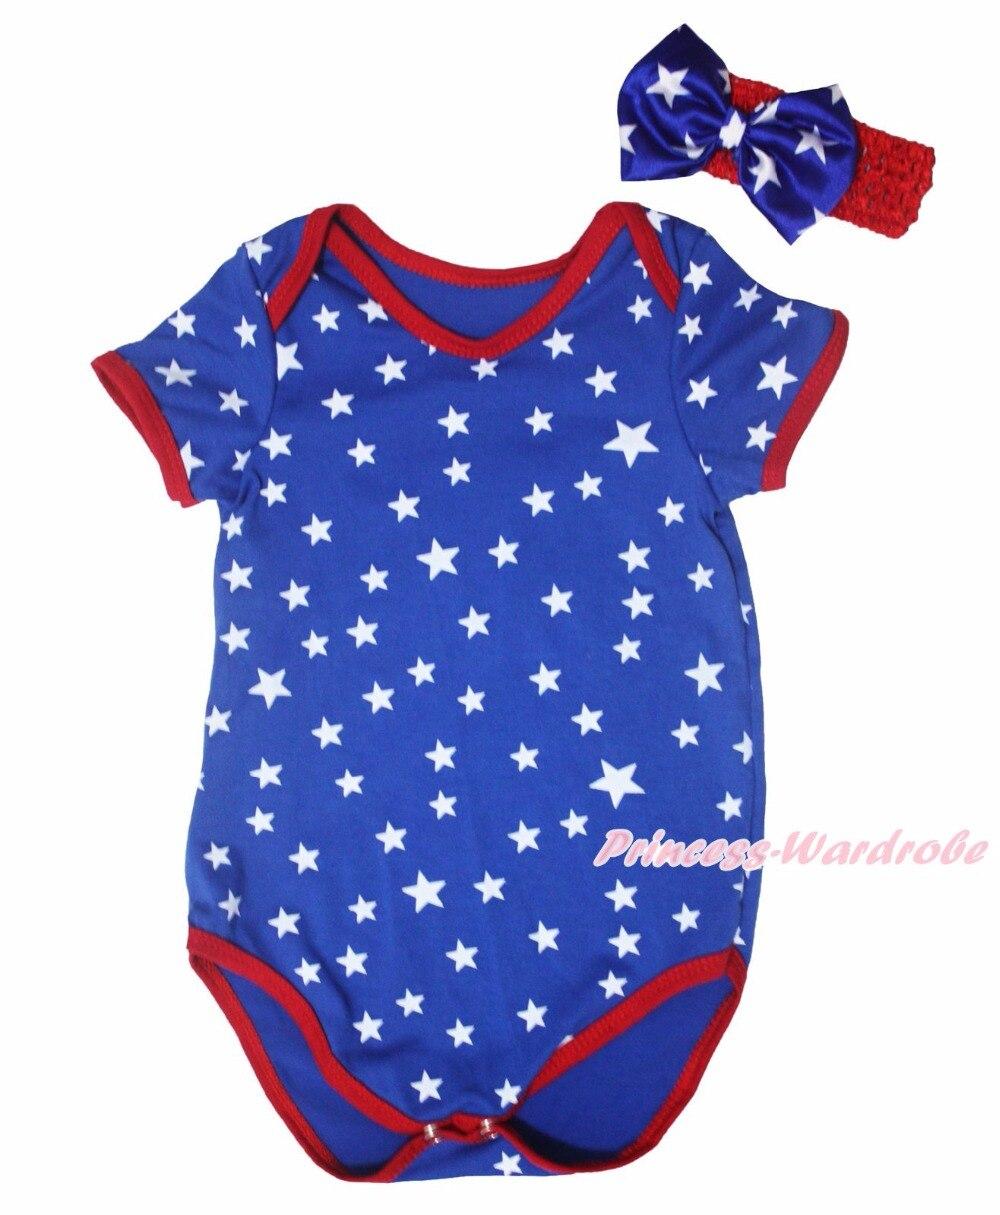 4th July America Heart Born In USA RWB Neckerchief Tie Patriotic Star Royal Blue Baby One Piece Girls Bodysuit Jumpsuit NB-18M